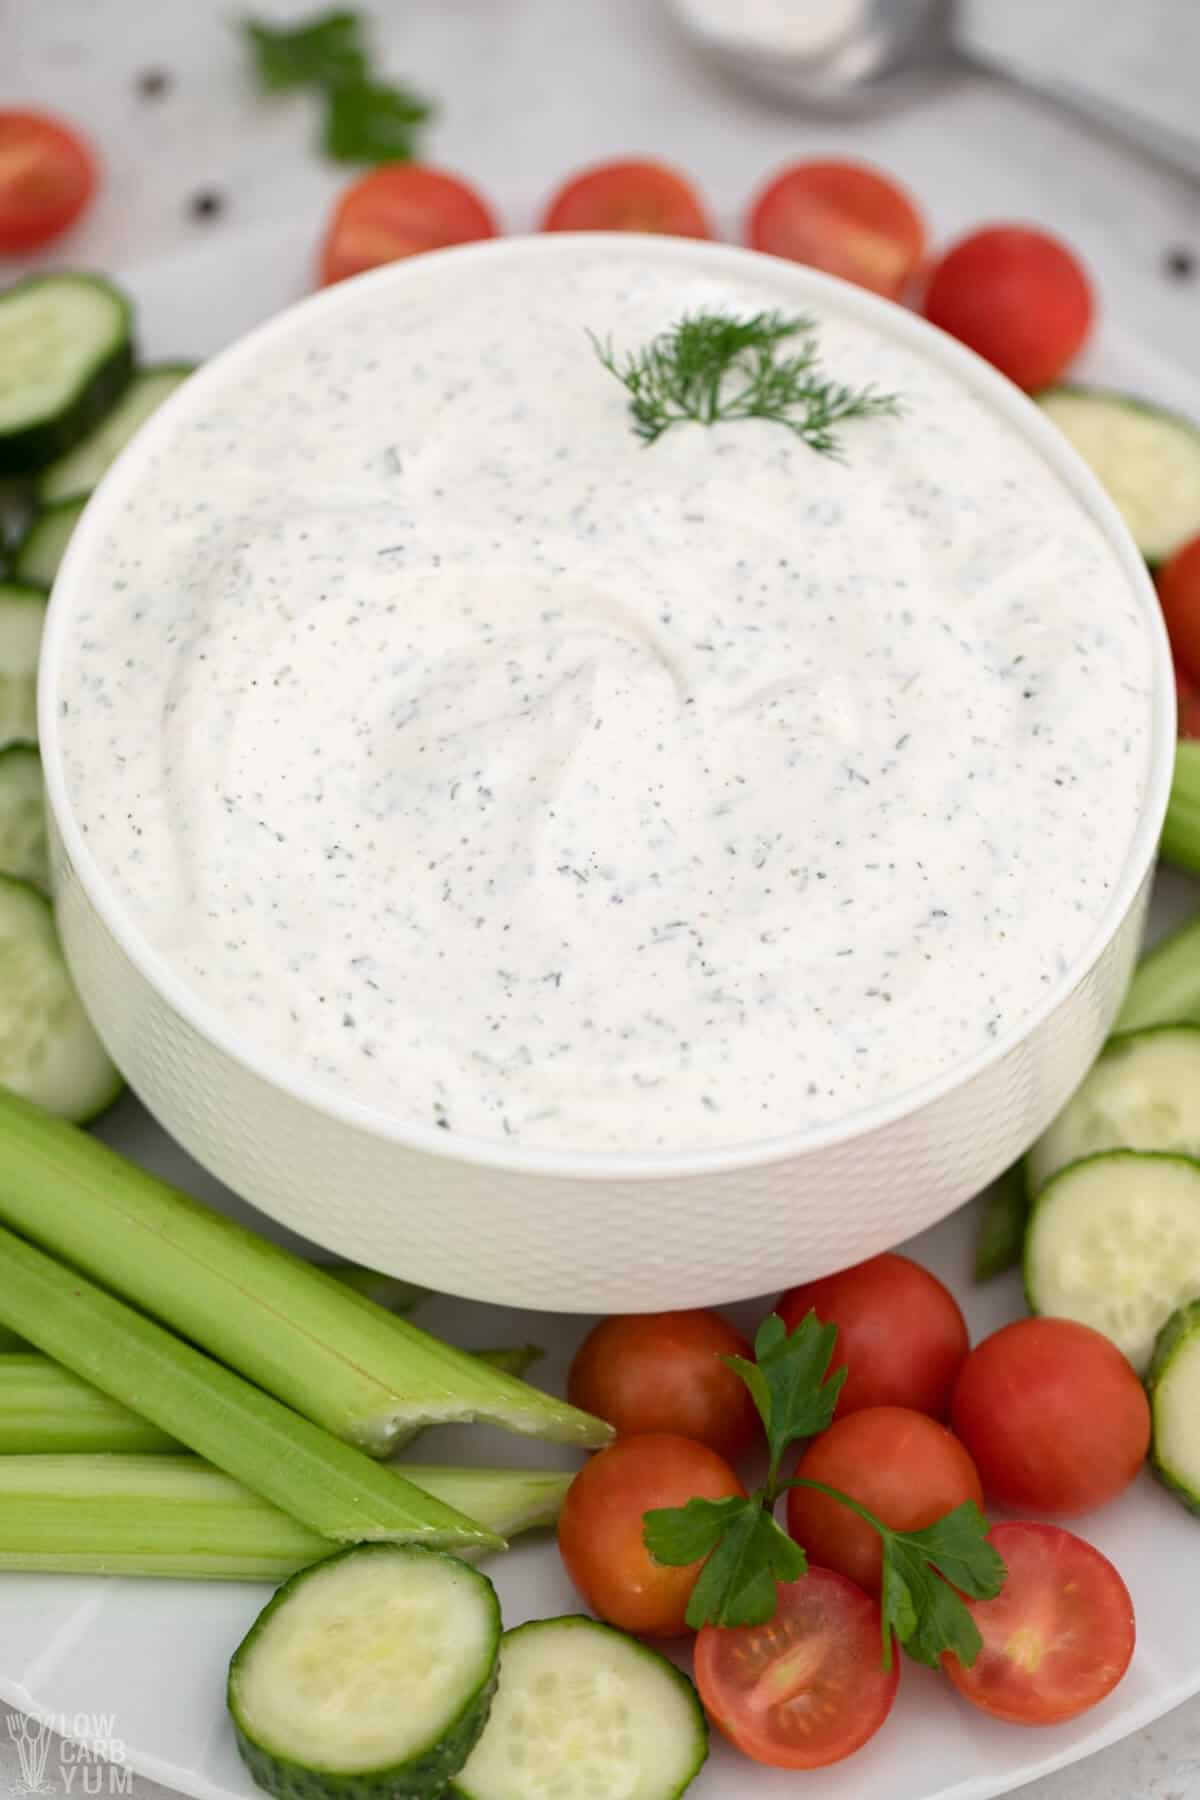 keto ranch vegetable dip in bowl with veggies